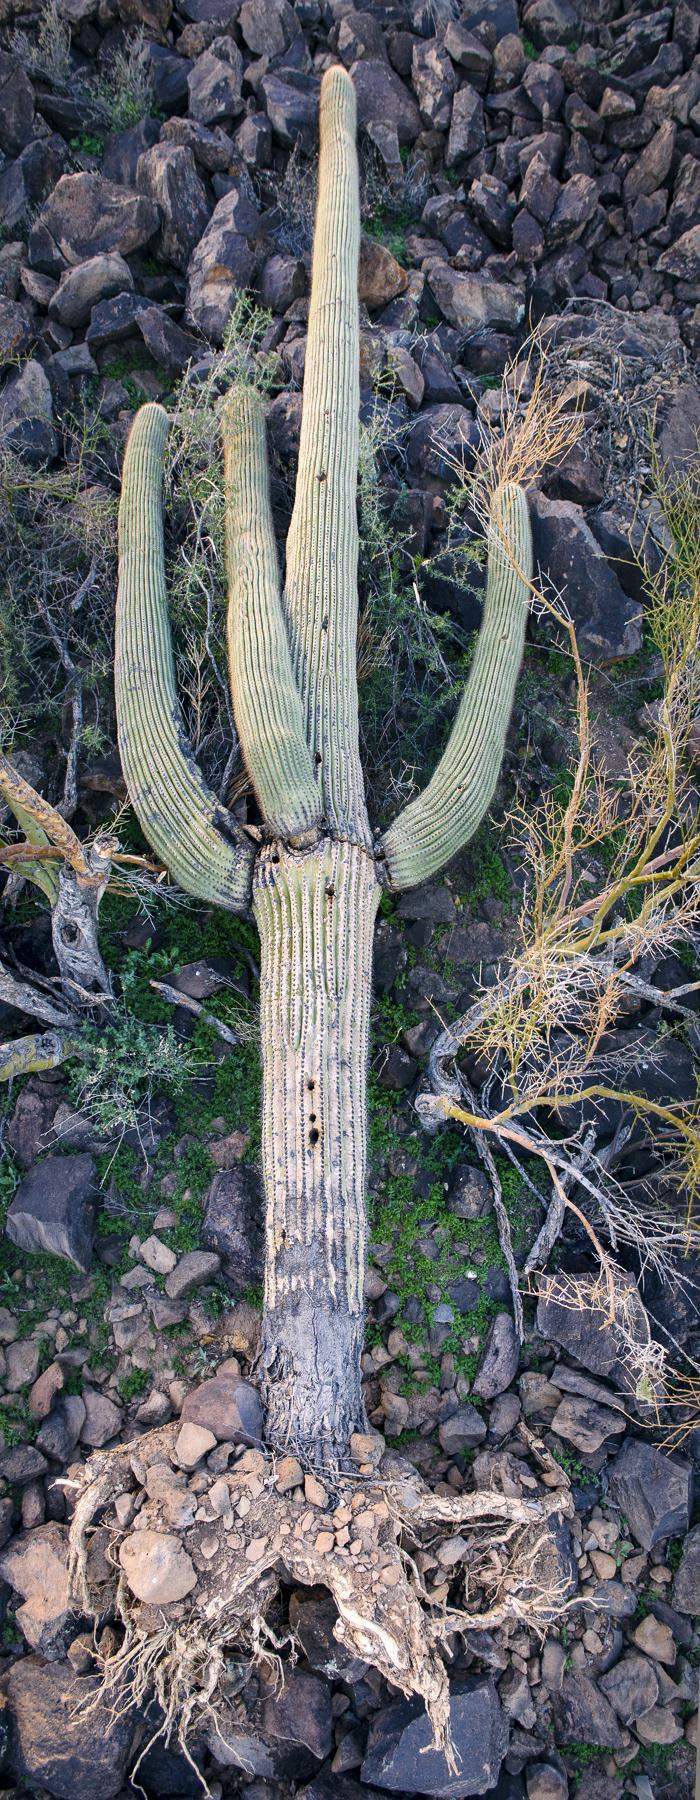 Fallen Saguaro, photo by paul mirocha